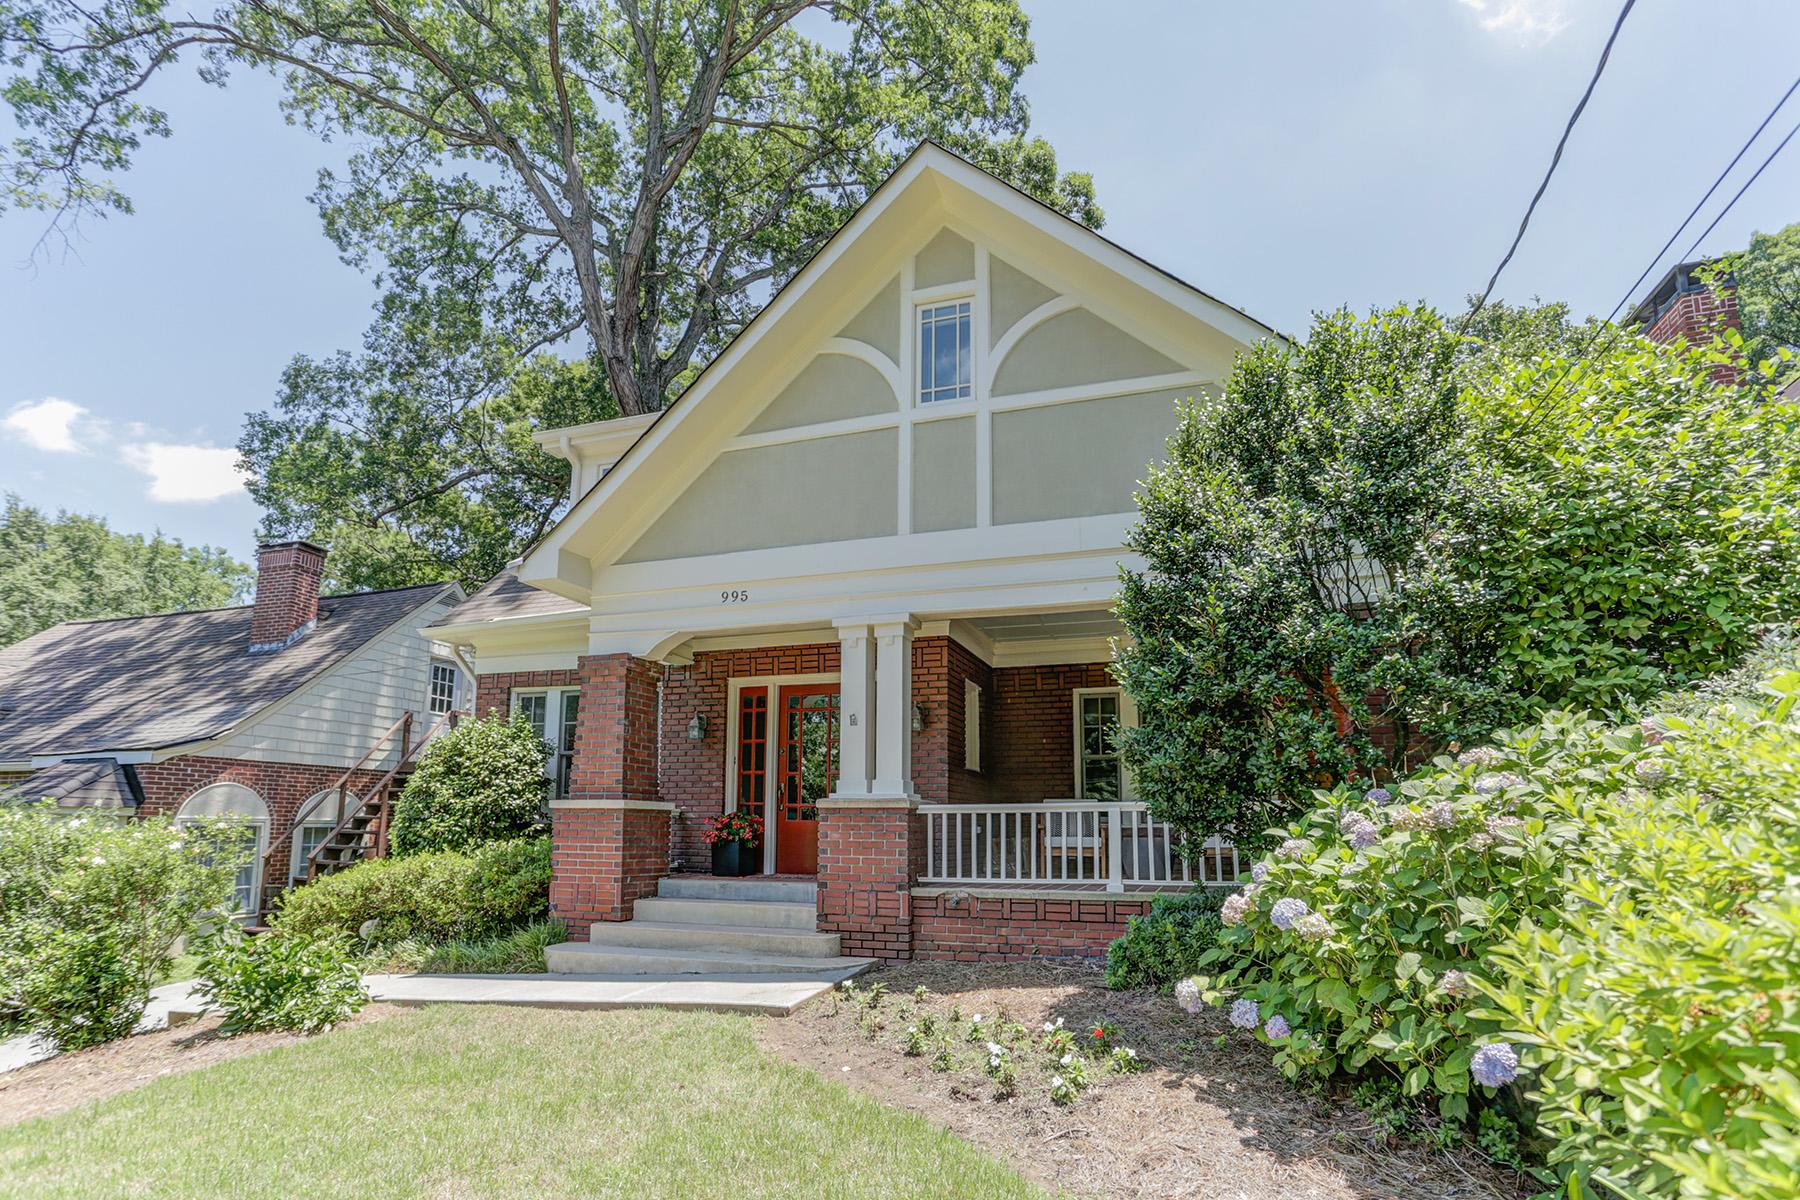 Single Family Homes для того Продажа на Lovingly Renovated In Virginia Highland 995 Rosedale Road NE, Atlanta, Джорджия 30306 Соединенные Штаты